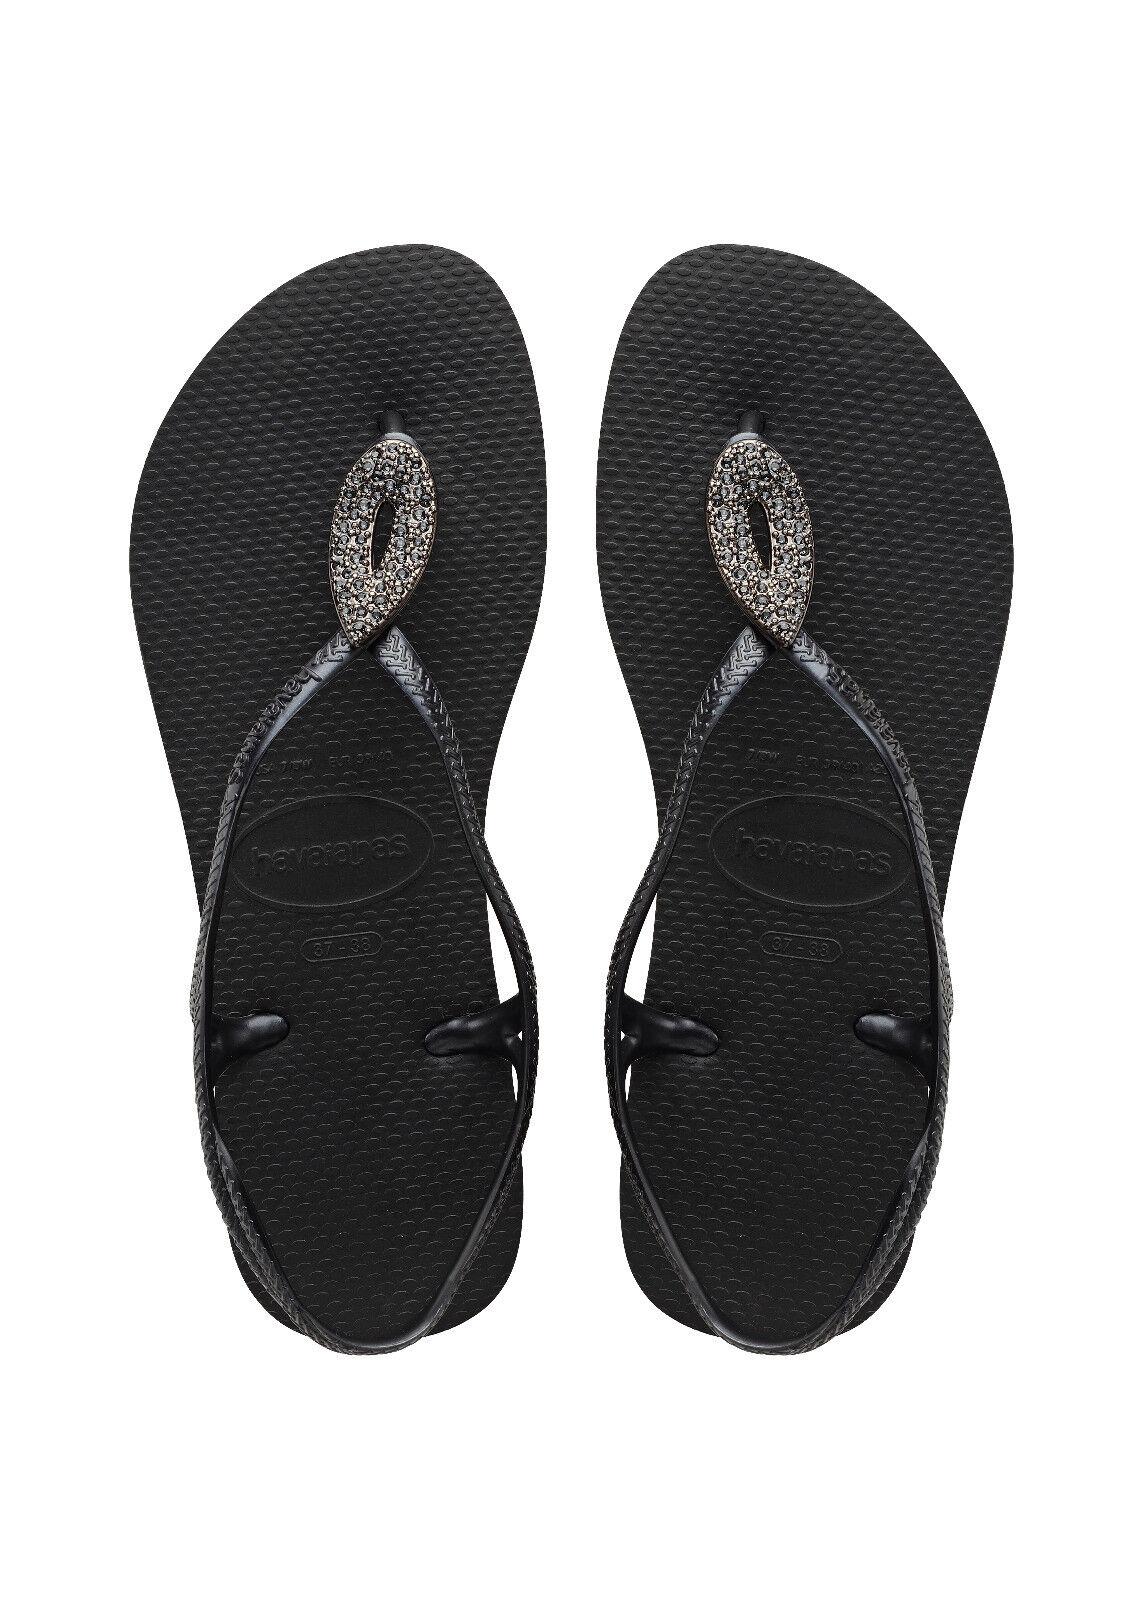 HAVAIANAS Zehentrenner Badeschuhe Thongs Sandale LUNA SPECIAL schwarz schwarz NEU